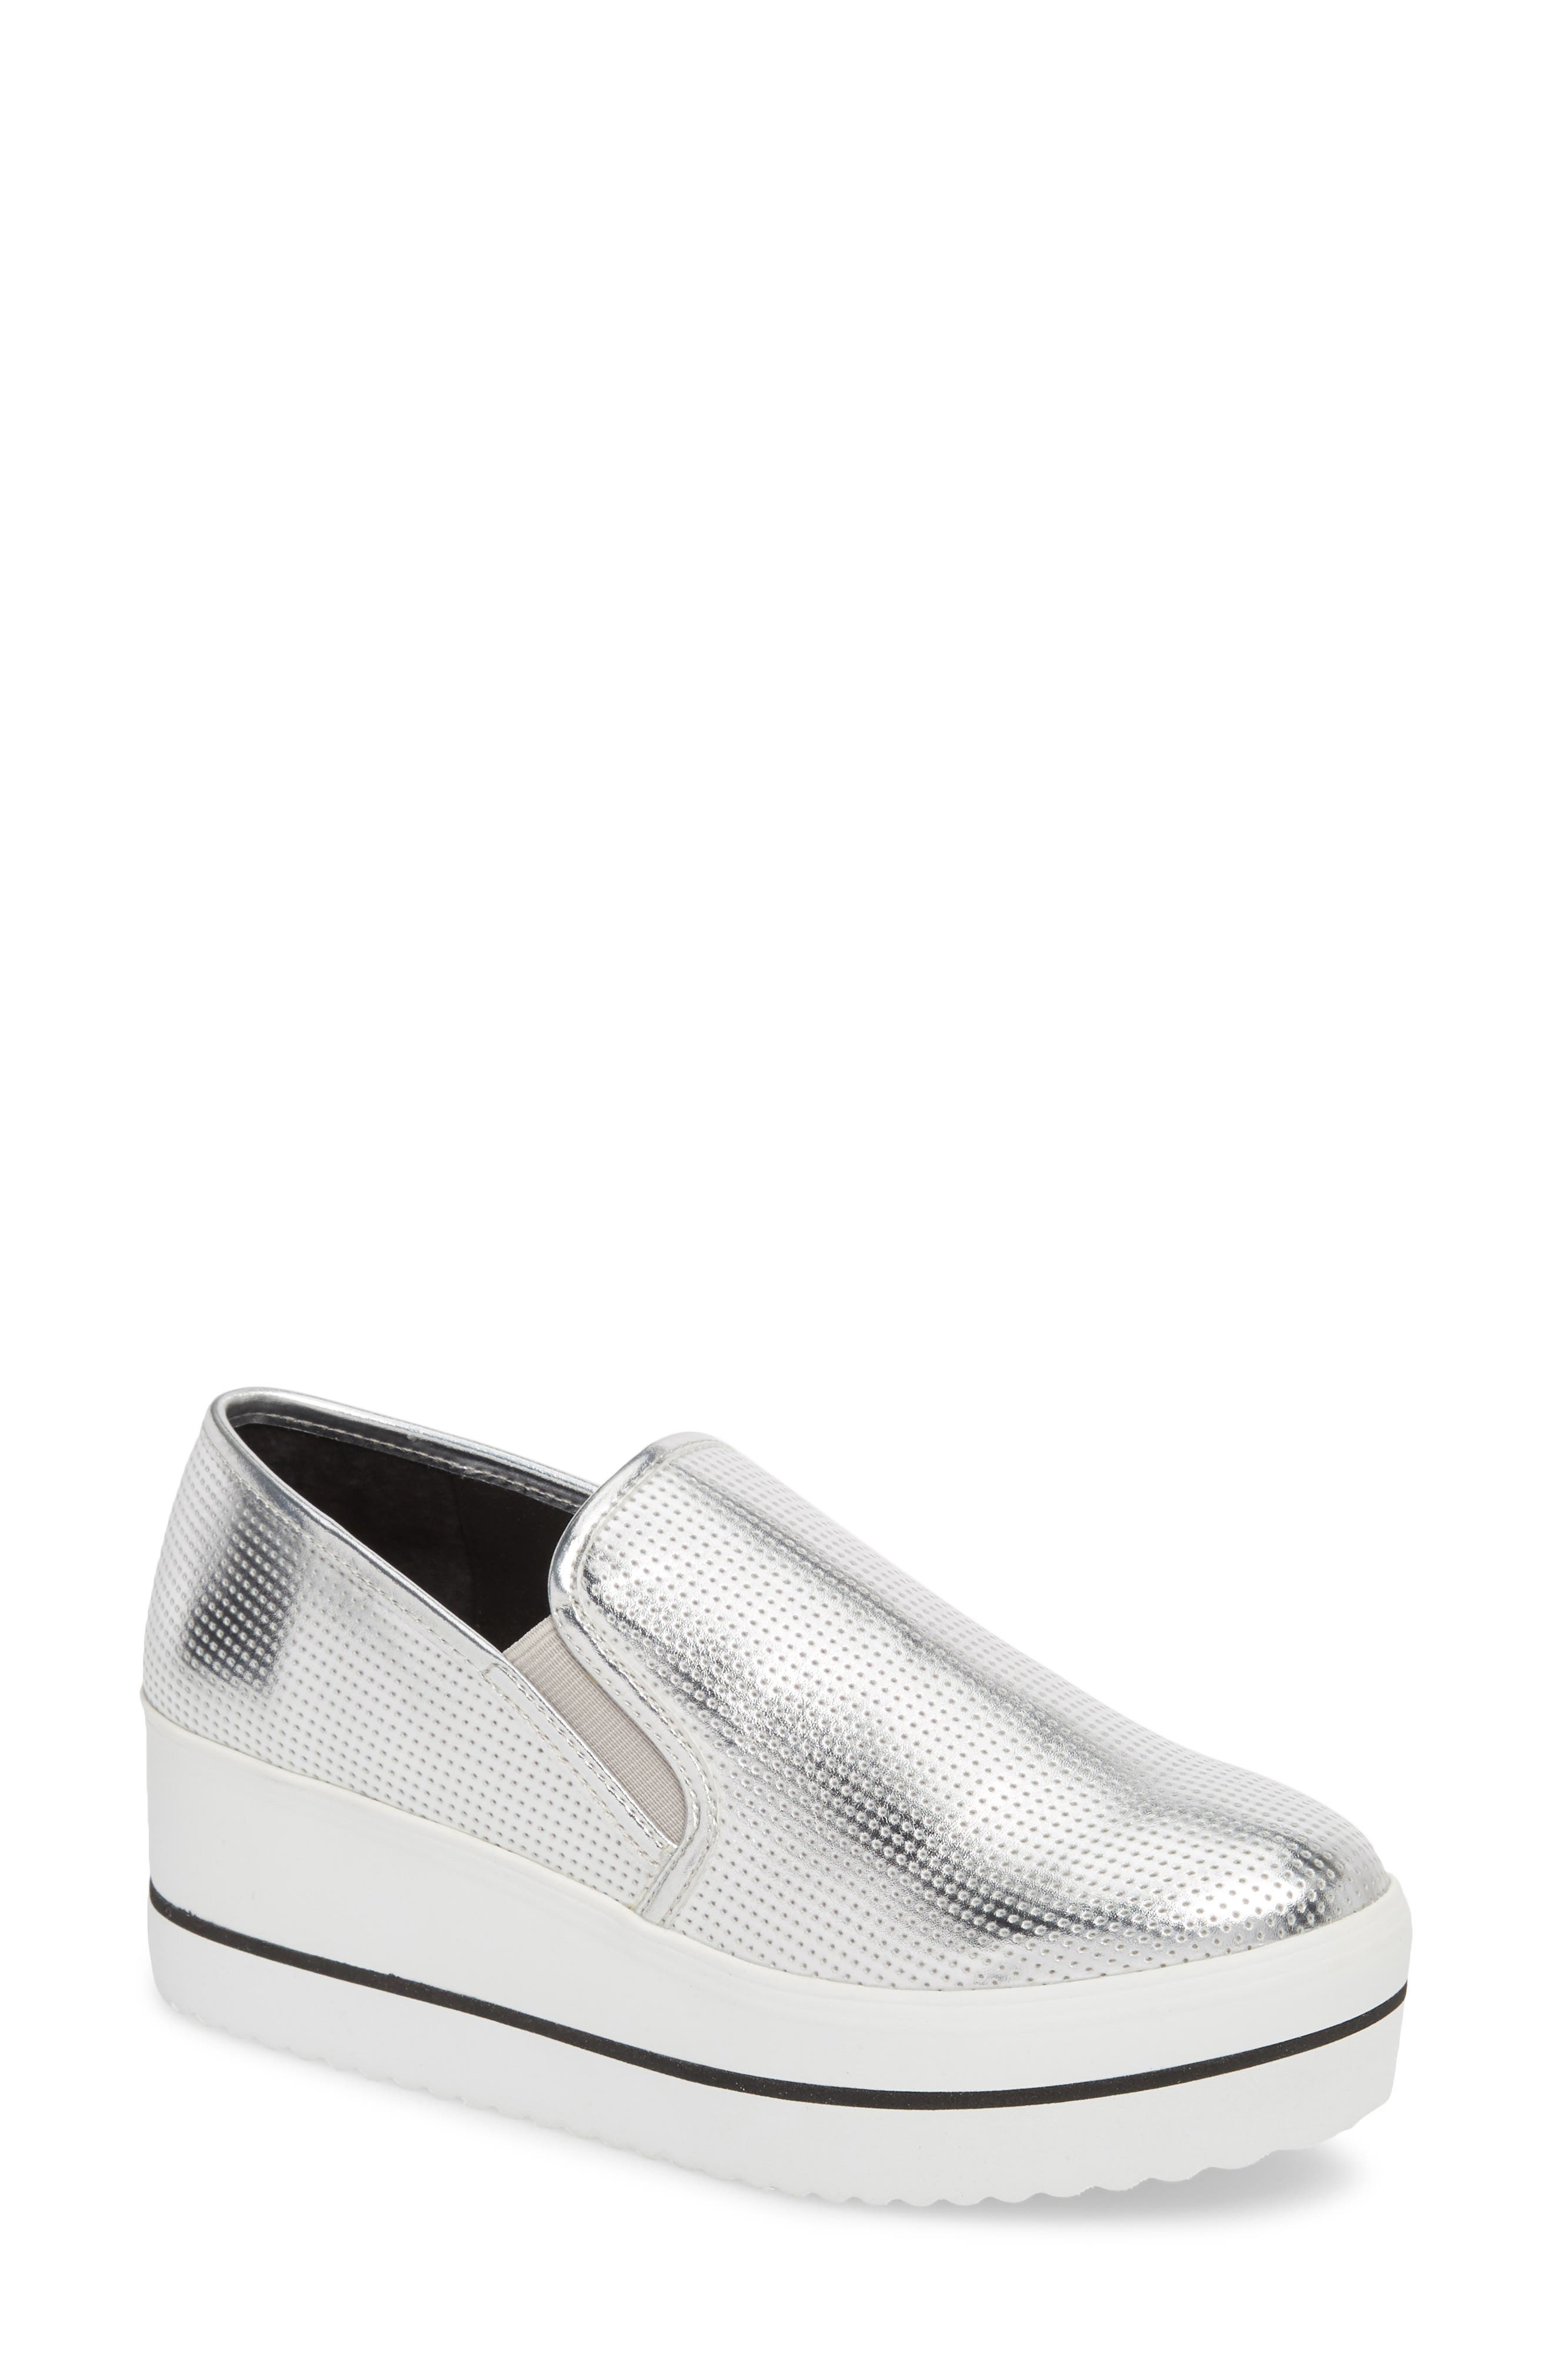 Becca Slip-On Sneaker,                         Main,                         color, SILVER